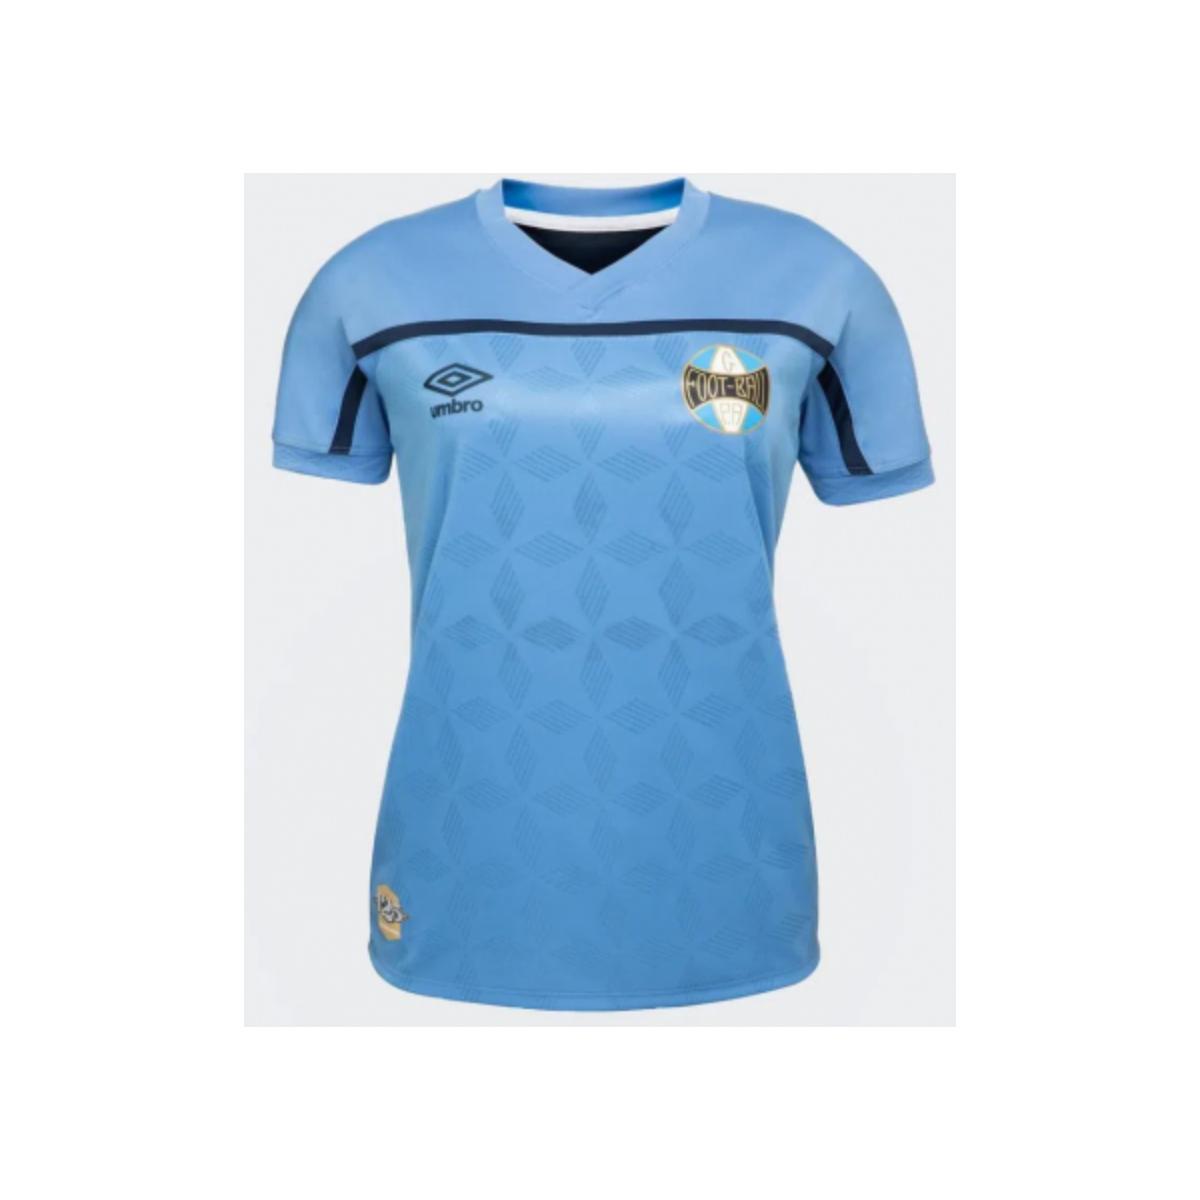 Camiseta Feminina Grêmio U32g514090 Of.3 2020 Torcedor Azul/marinho